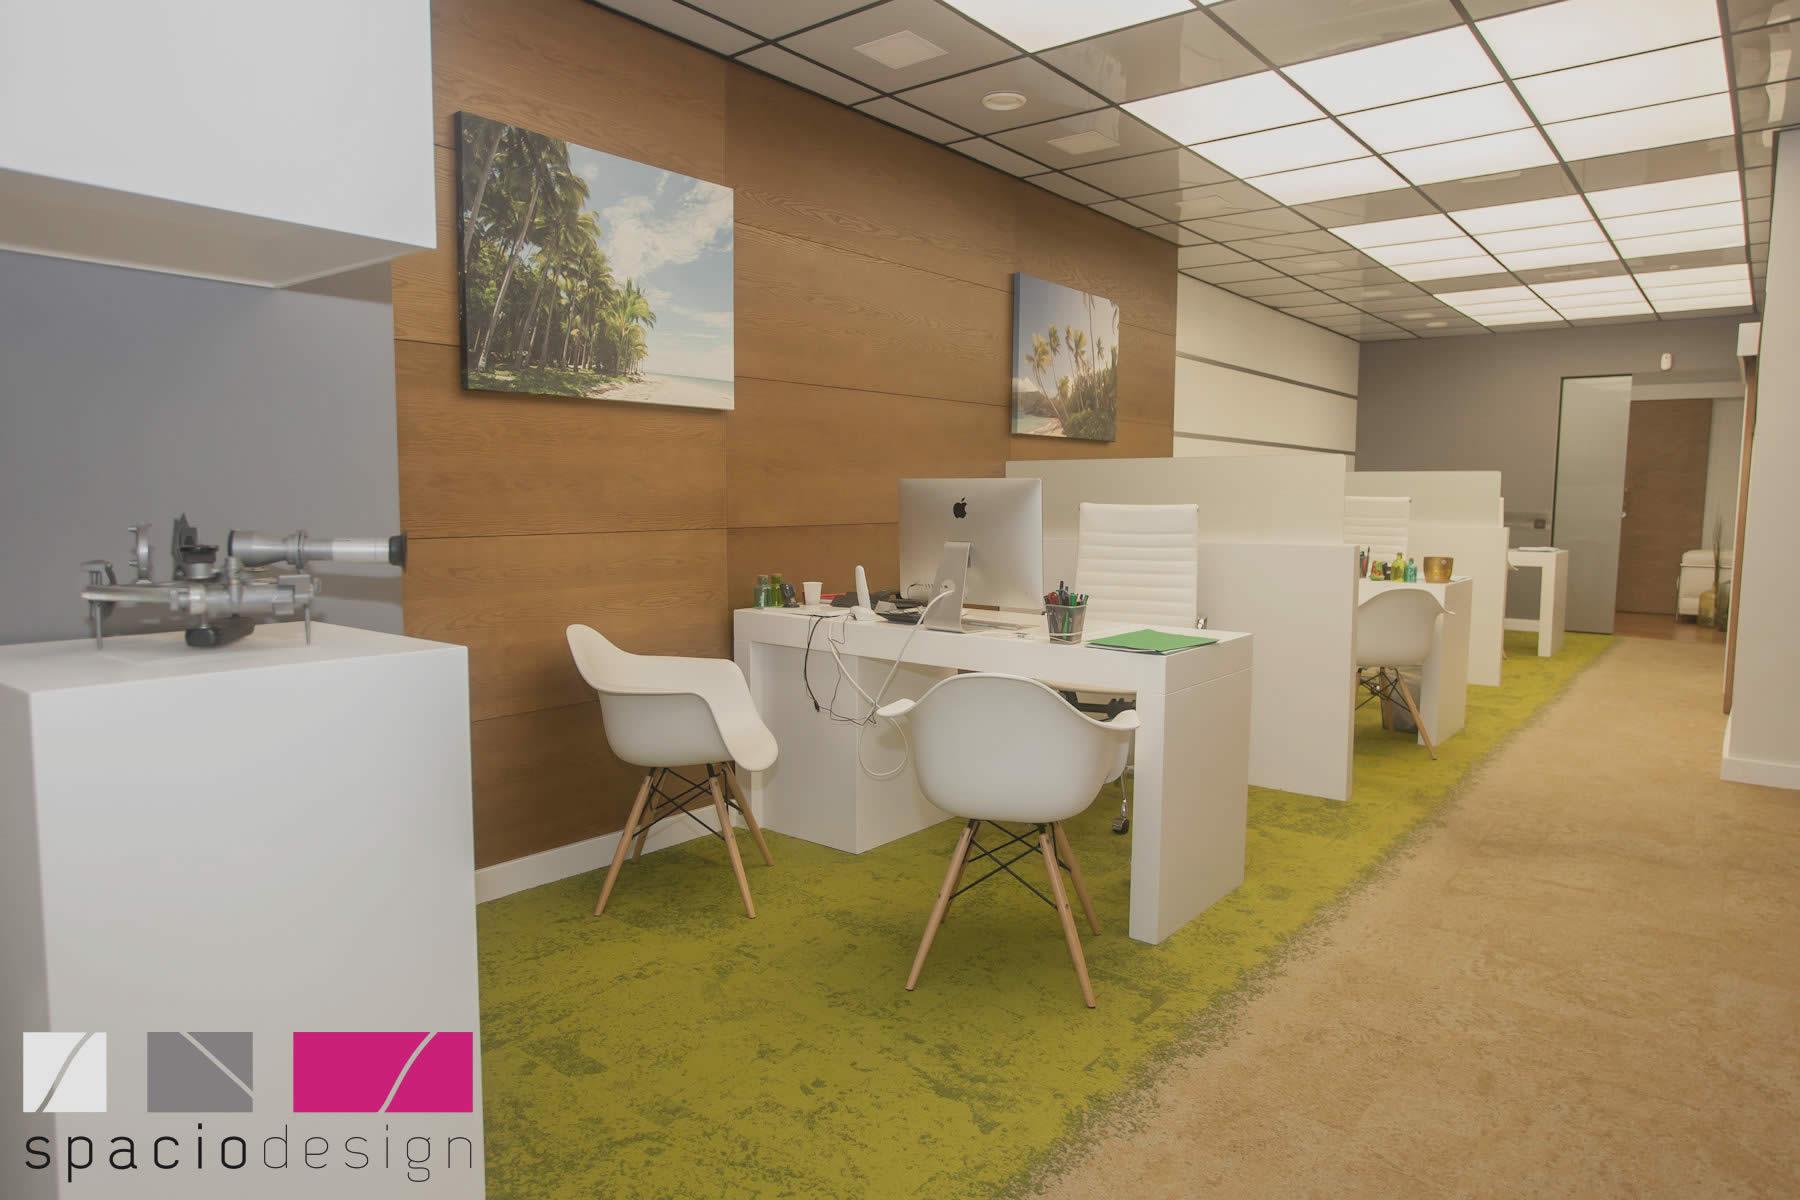 https://www.decoradorlaspalmas.com/wp-content/uploads/2017/10/interiorismo-decoracion-oficinas-las-palmas-gran-canaria.jpg